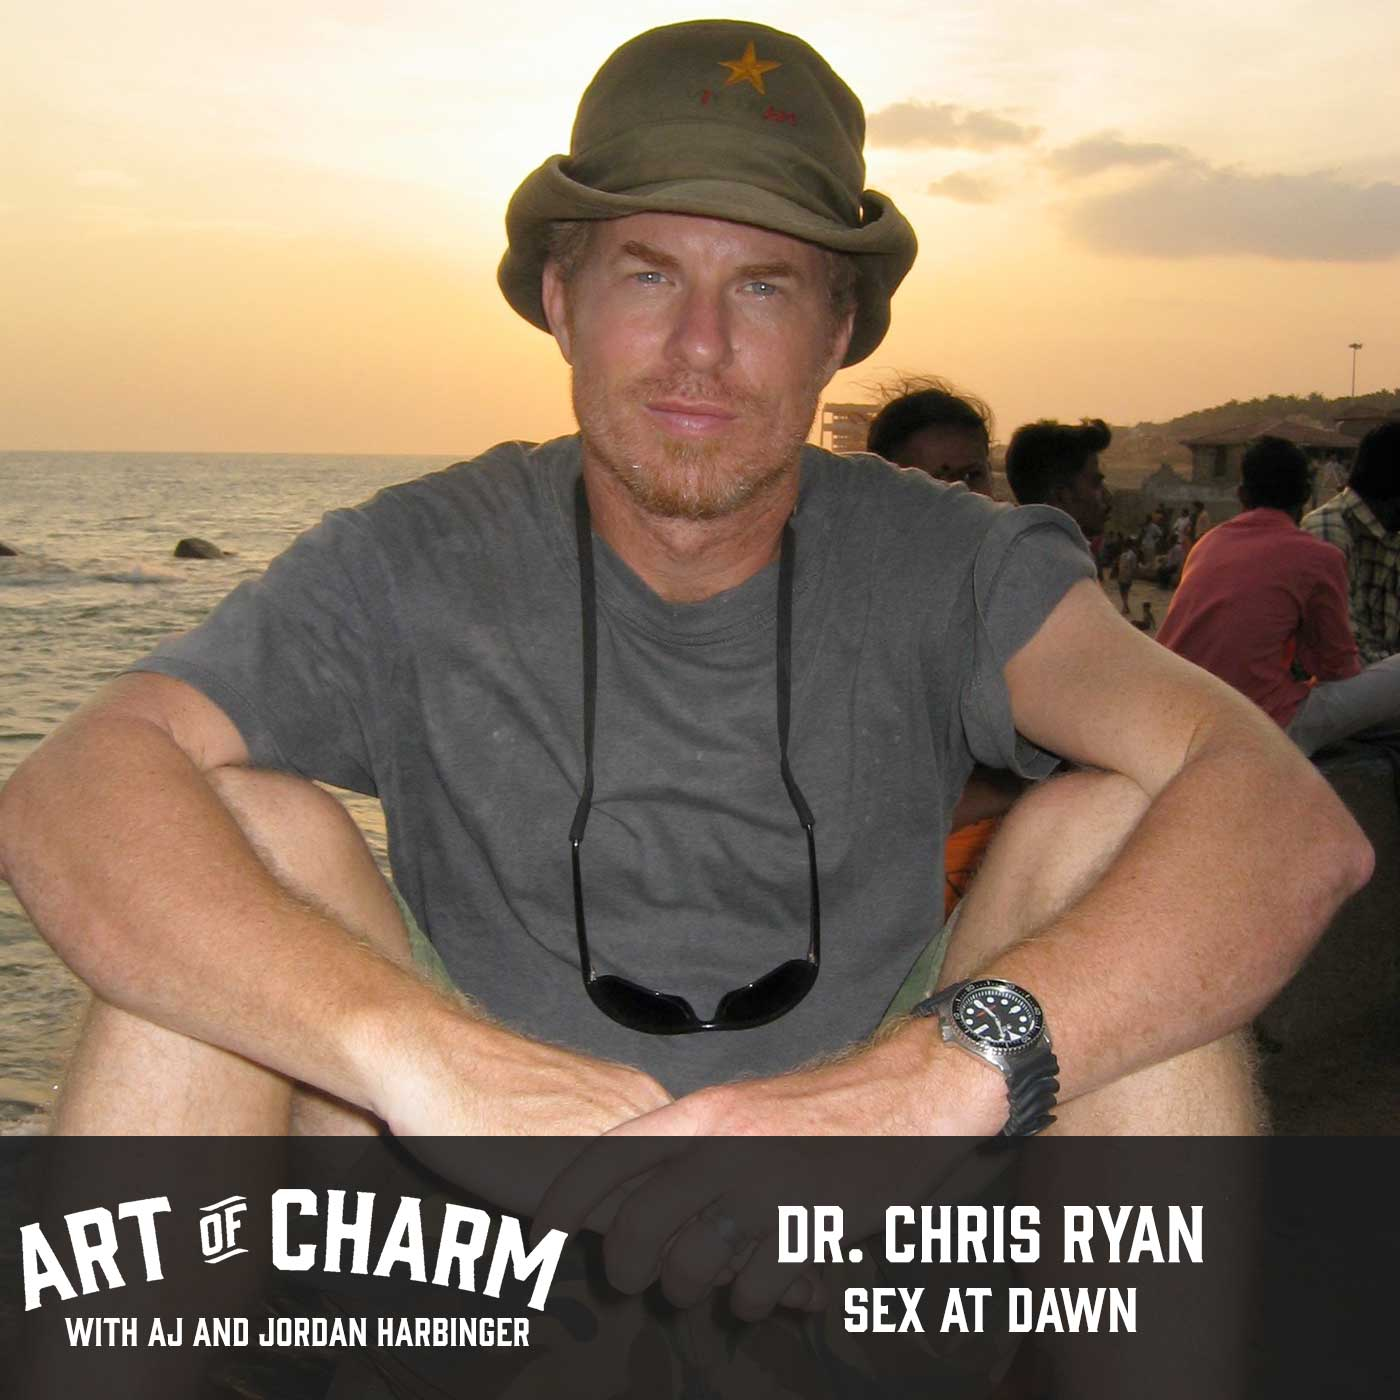 Chris ryan phd